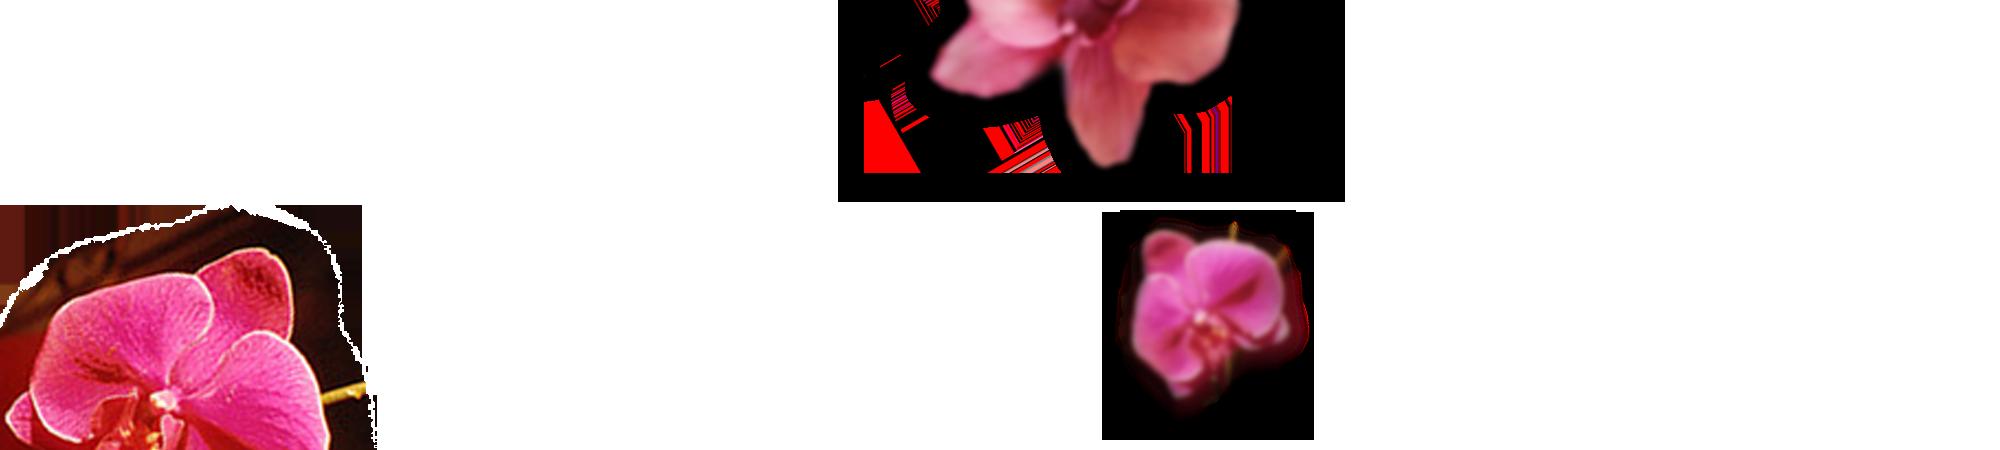 orchidee 2p